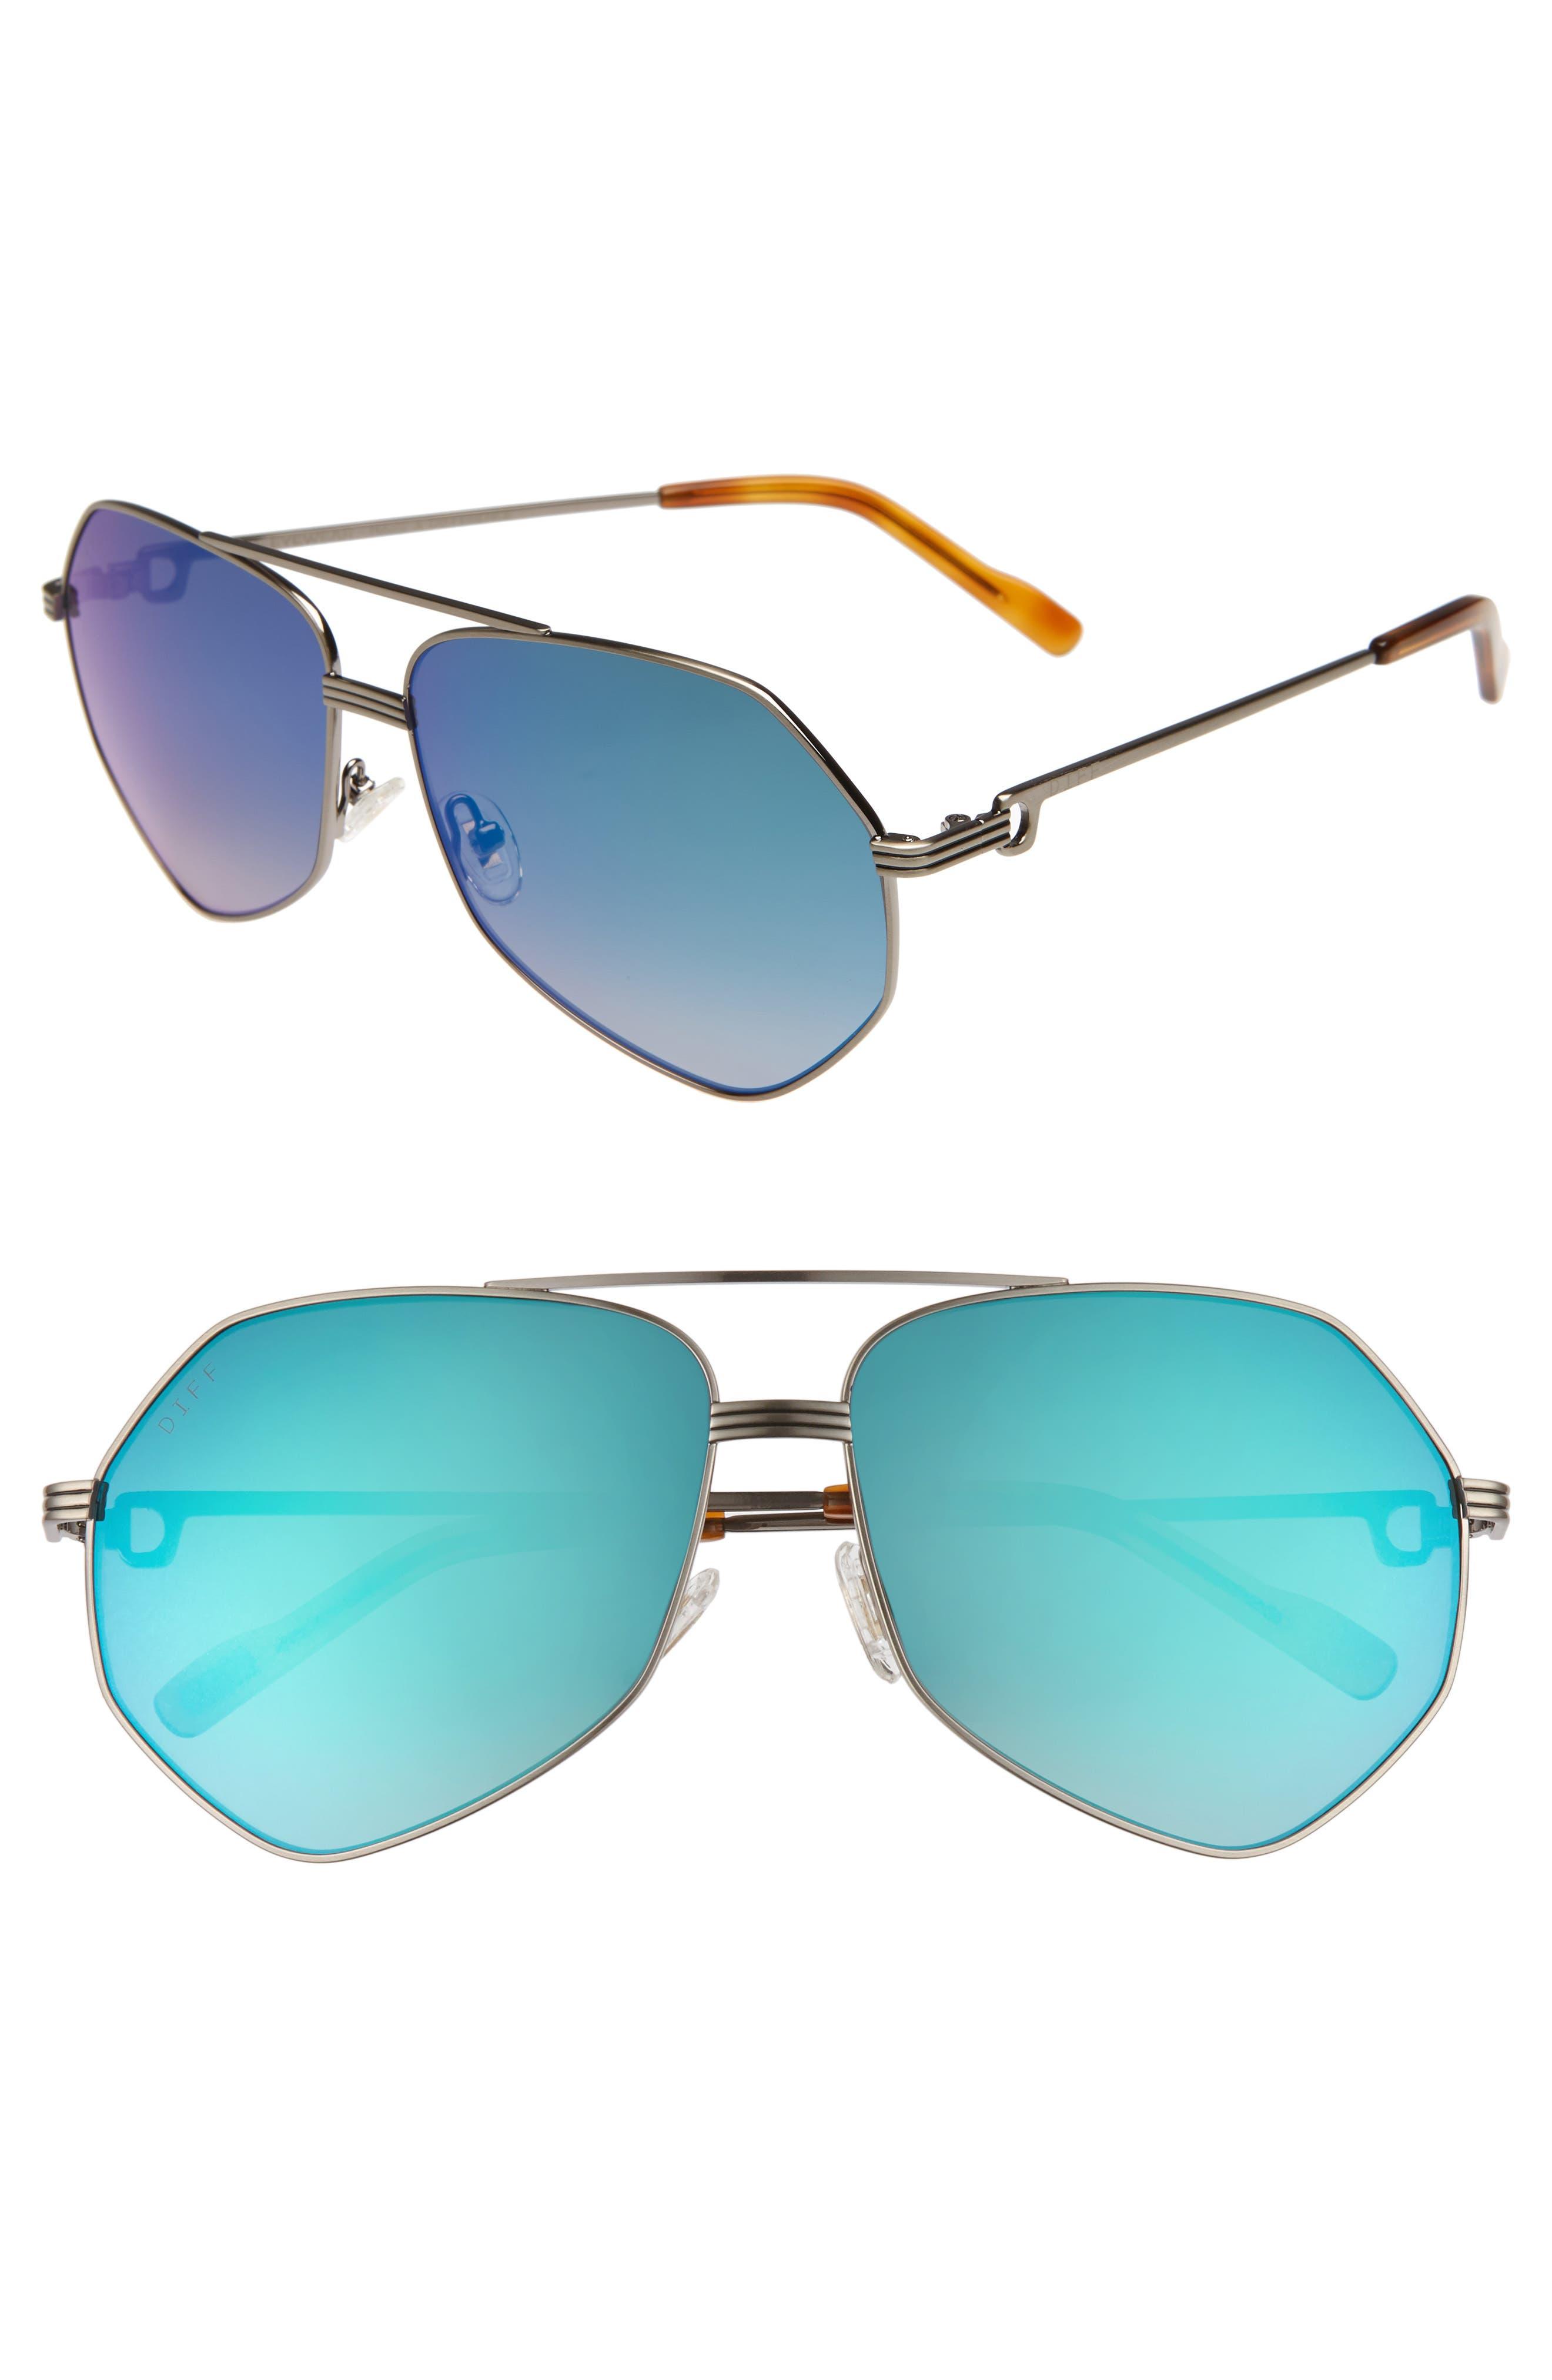 Sidney Geo Aviator Sunglasses,                         Main,                         color, LIGHT GUNMETAL/ HONEY/ BLUE